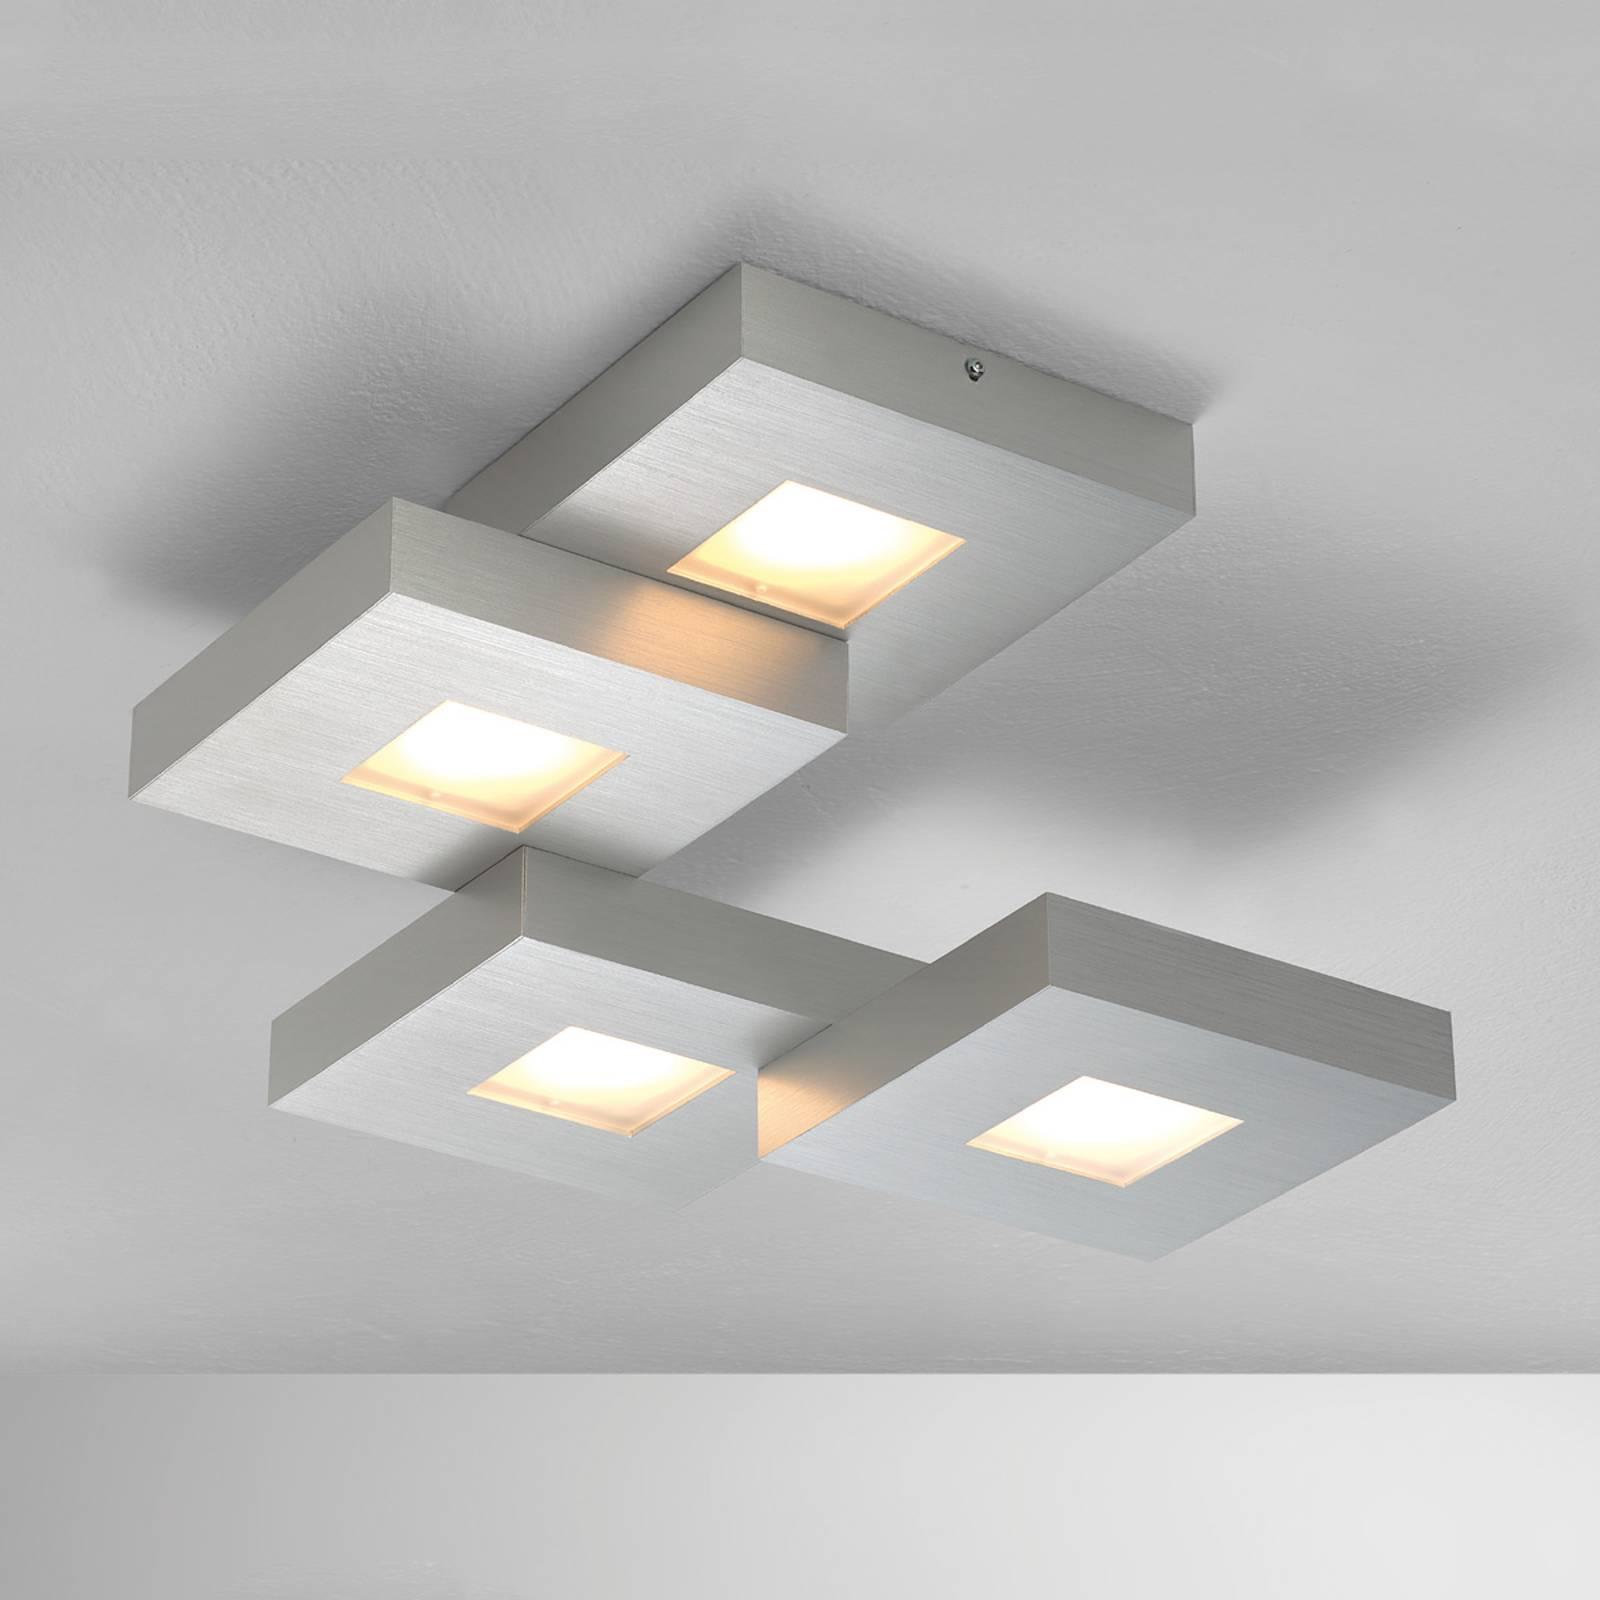 Bopp Cubus - treppenförmige LED-Deckenleuchte